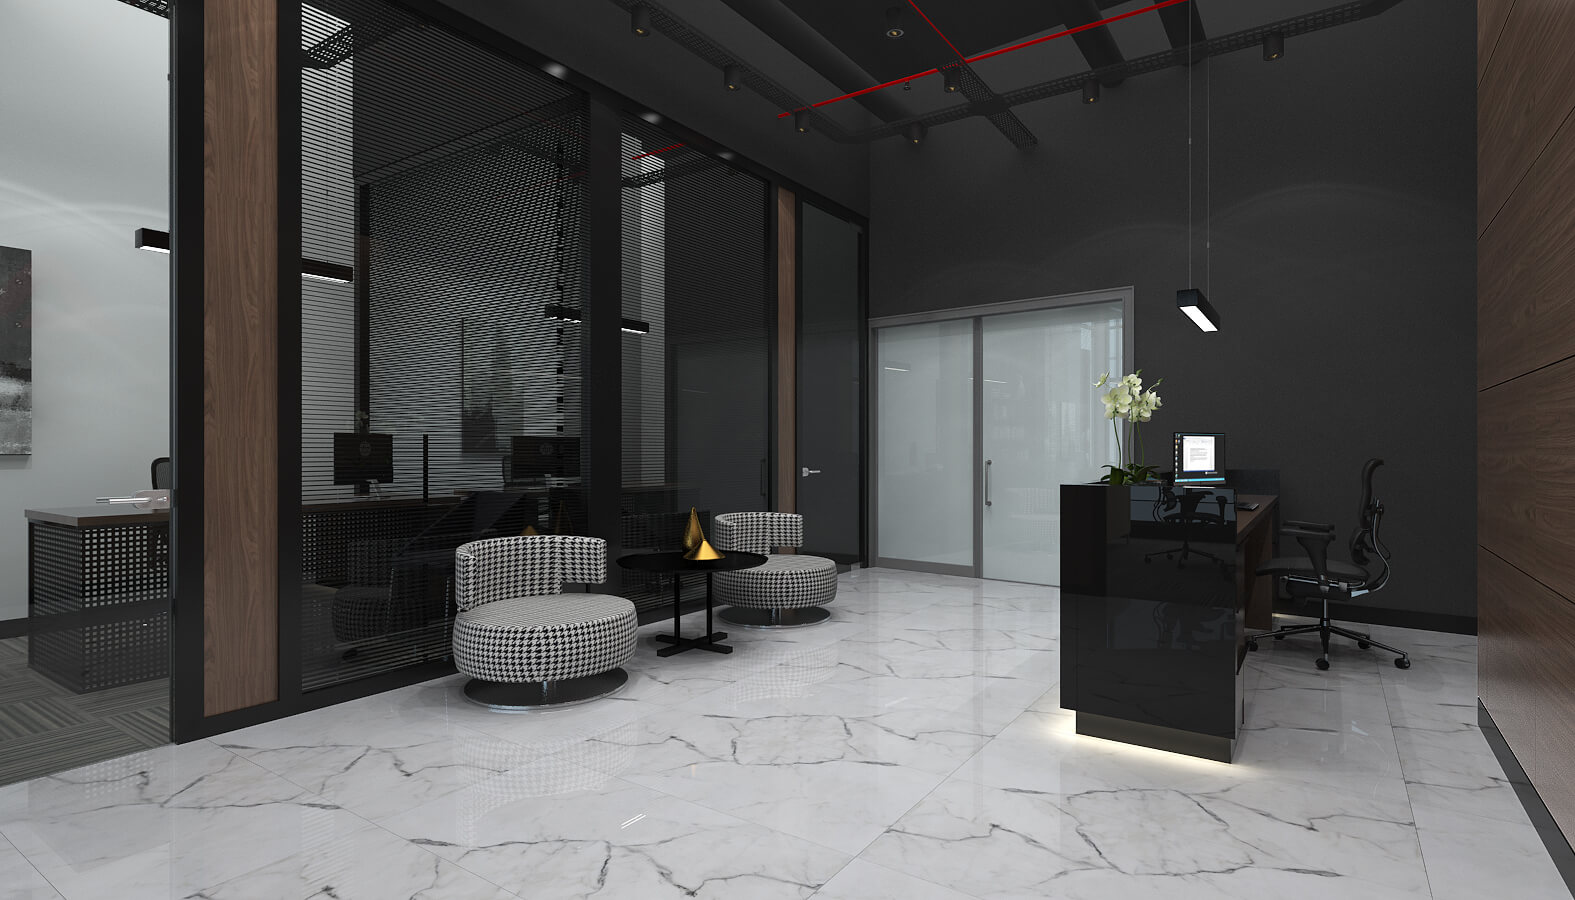 ofis içmimari 3504 Ascan Maden Çimento Ofisler